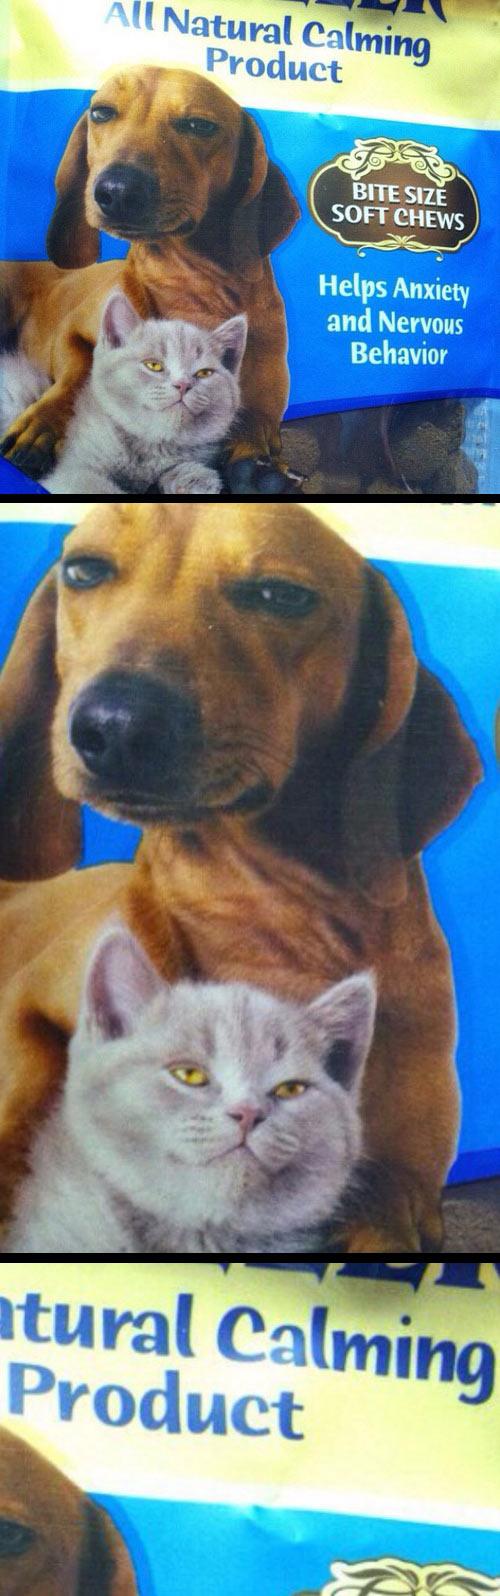 funny-dog-cat-calming-food